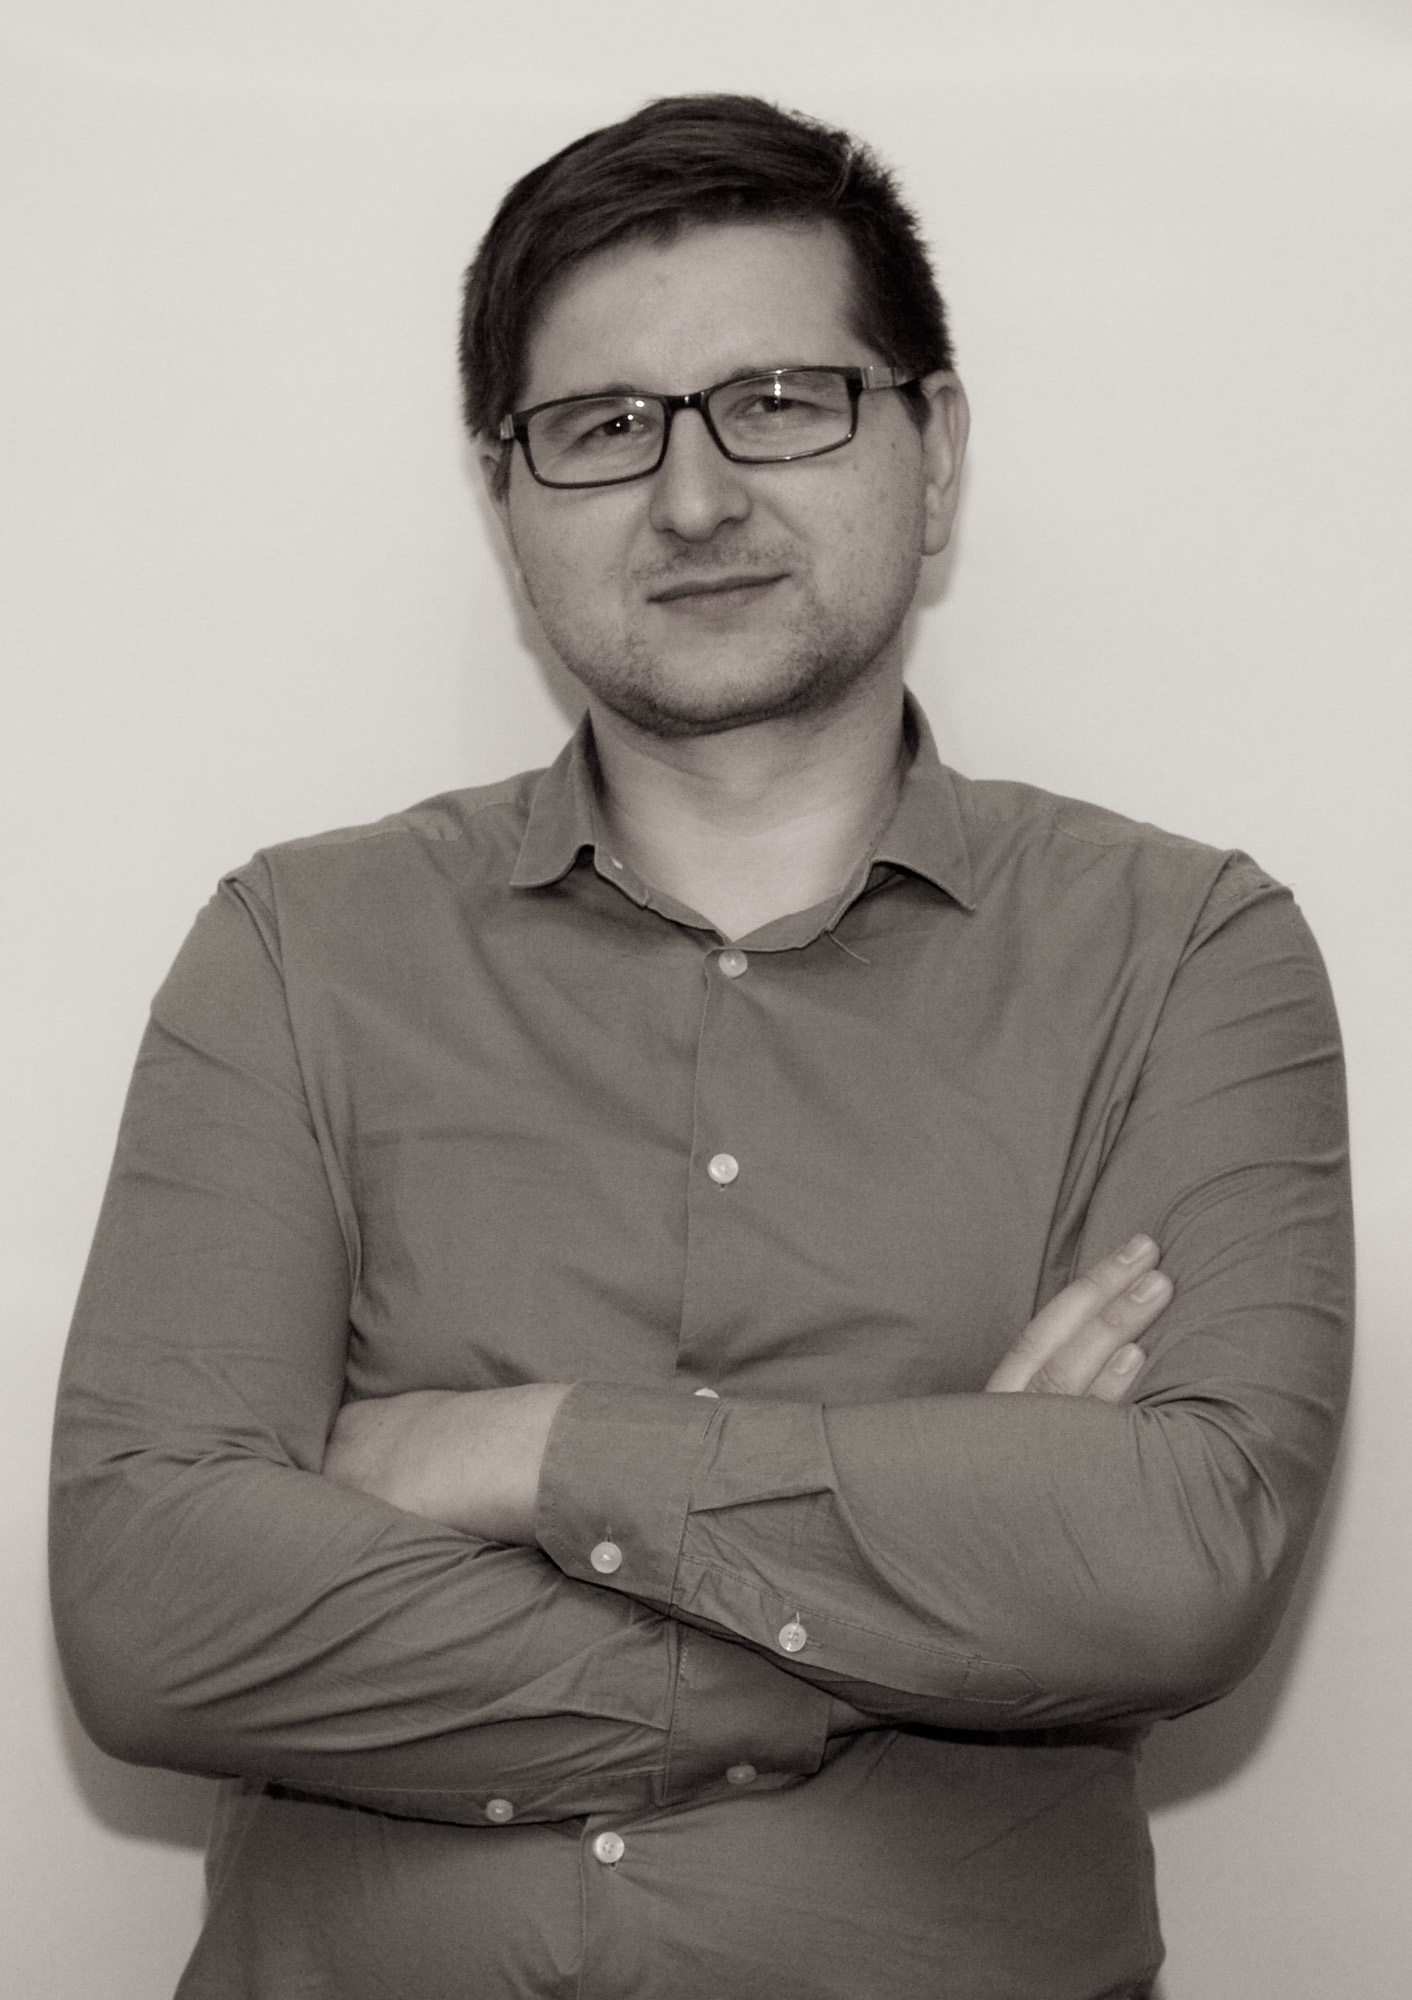 Marek Pietraszko